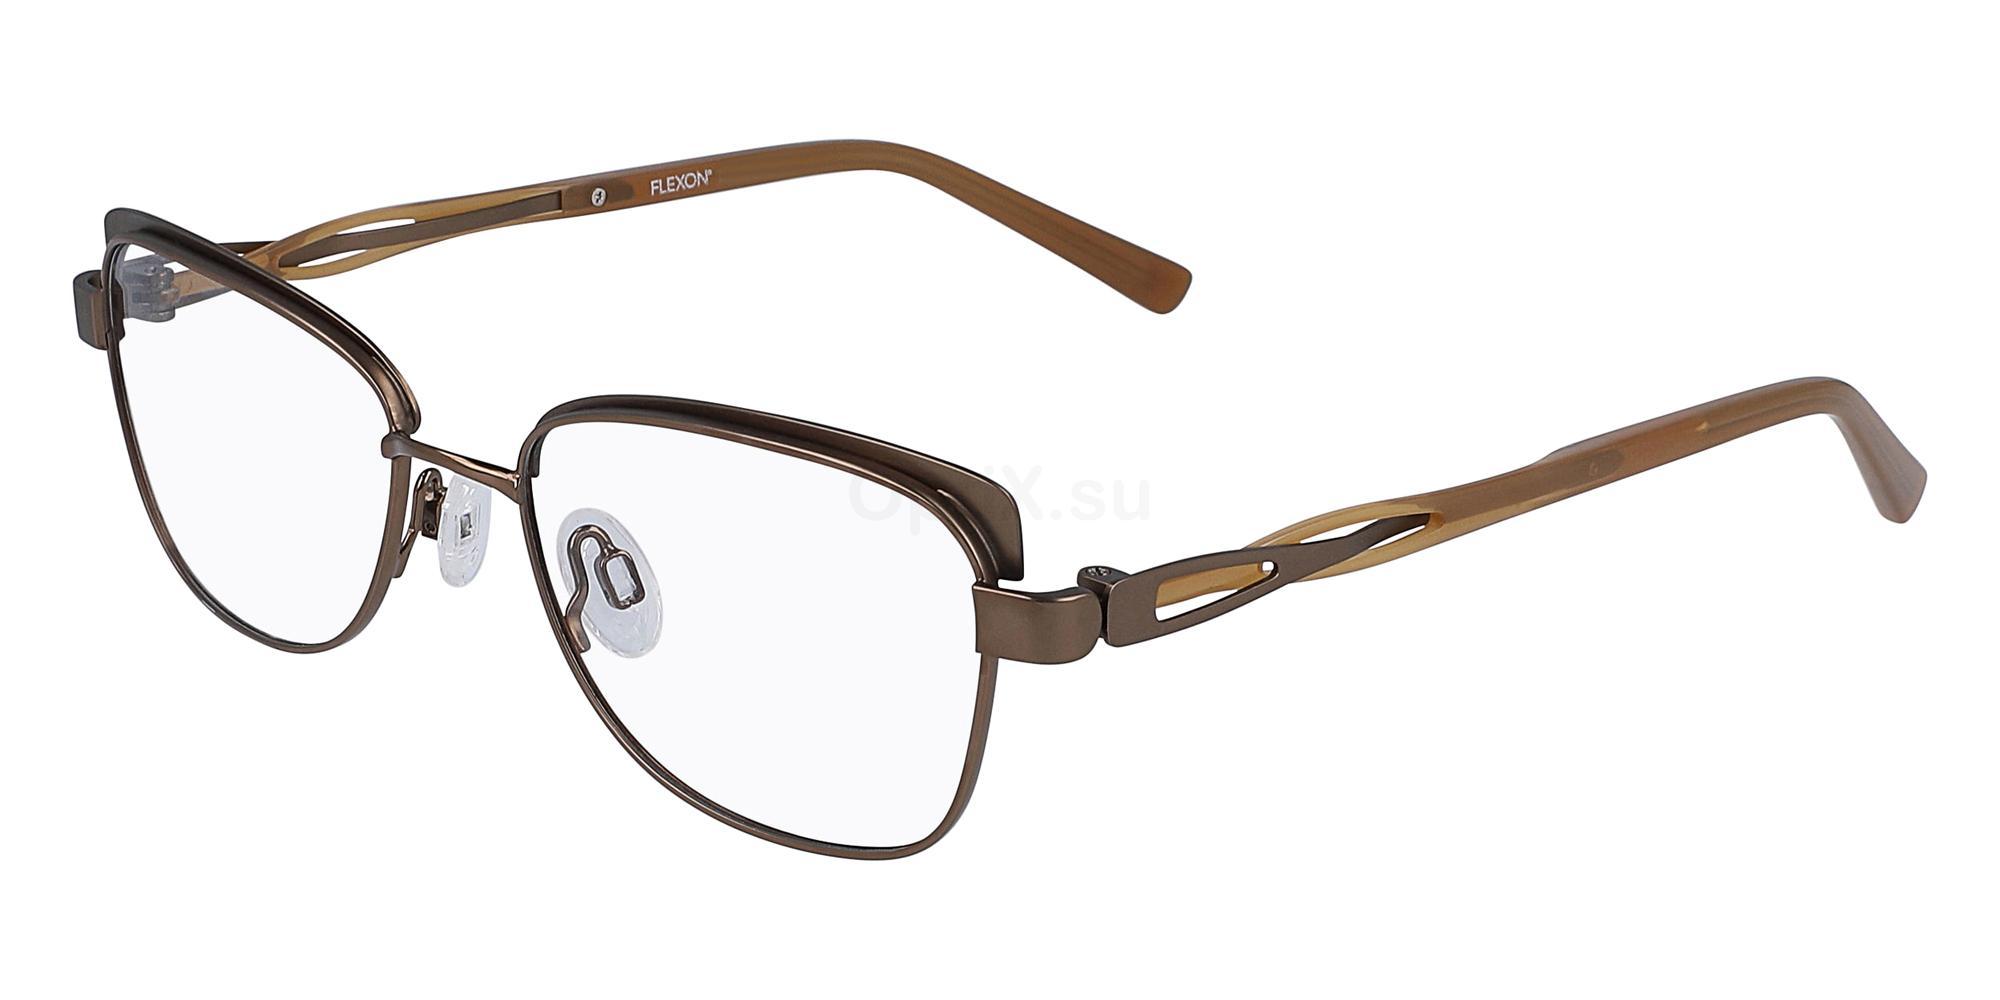 210 FLEXON W3012 Glasses, Flexon